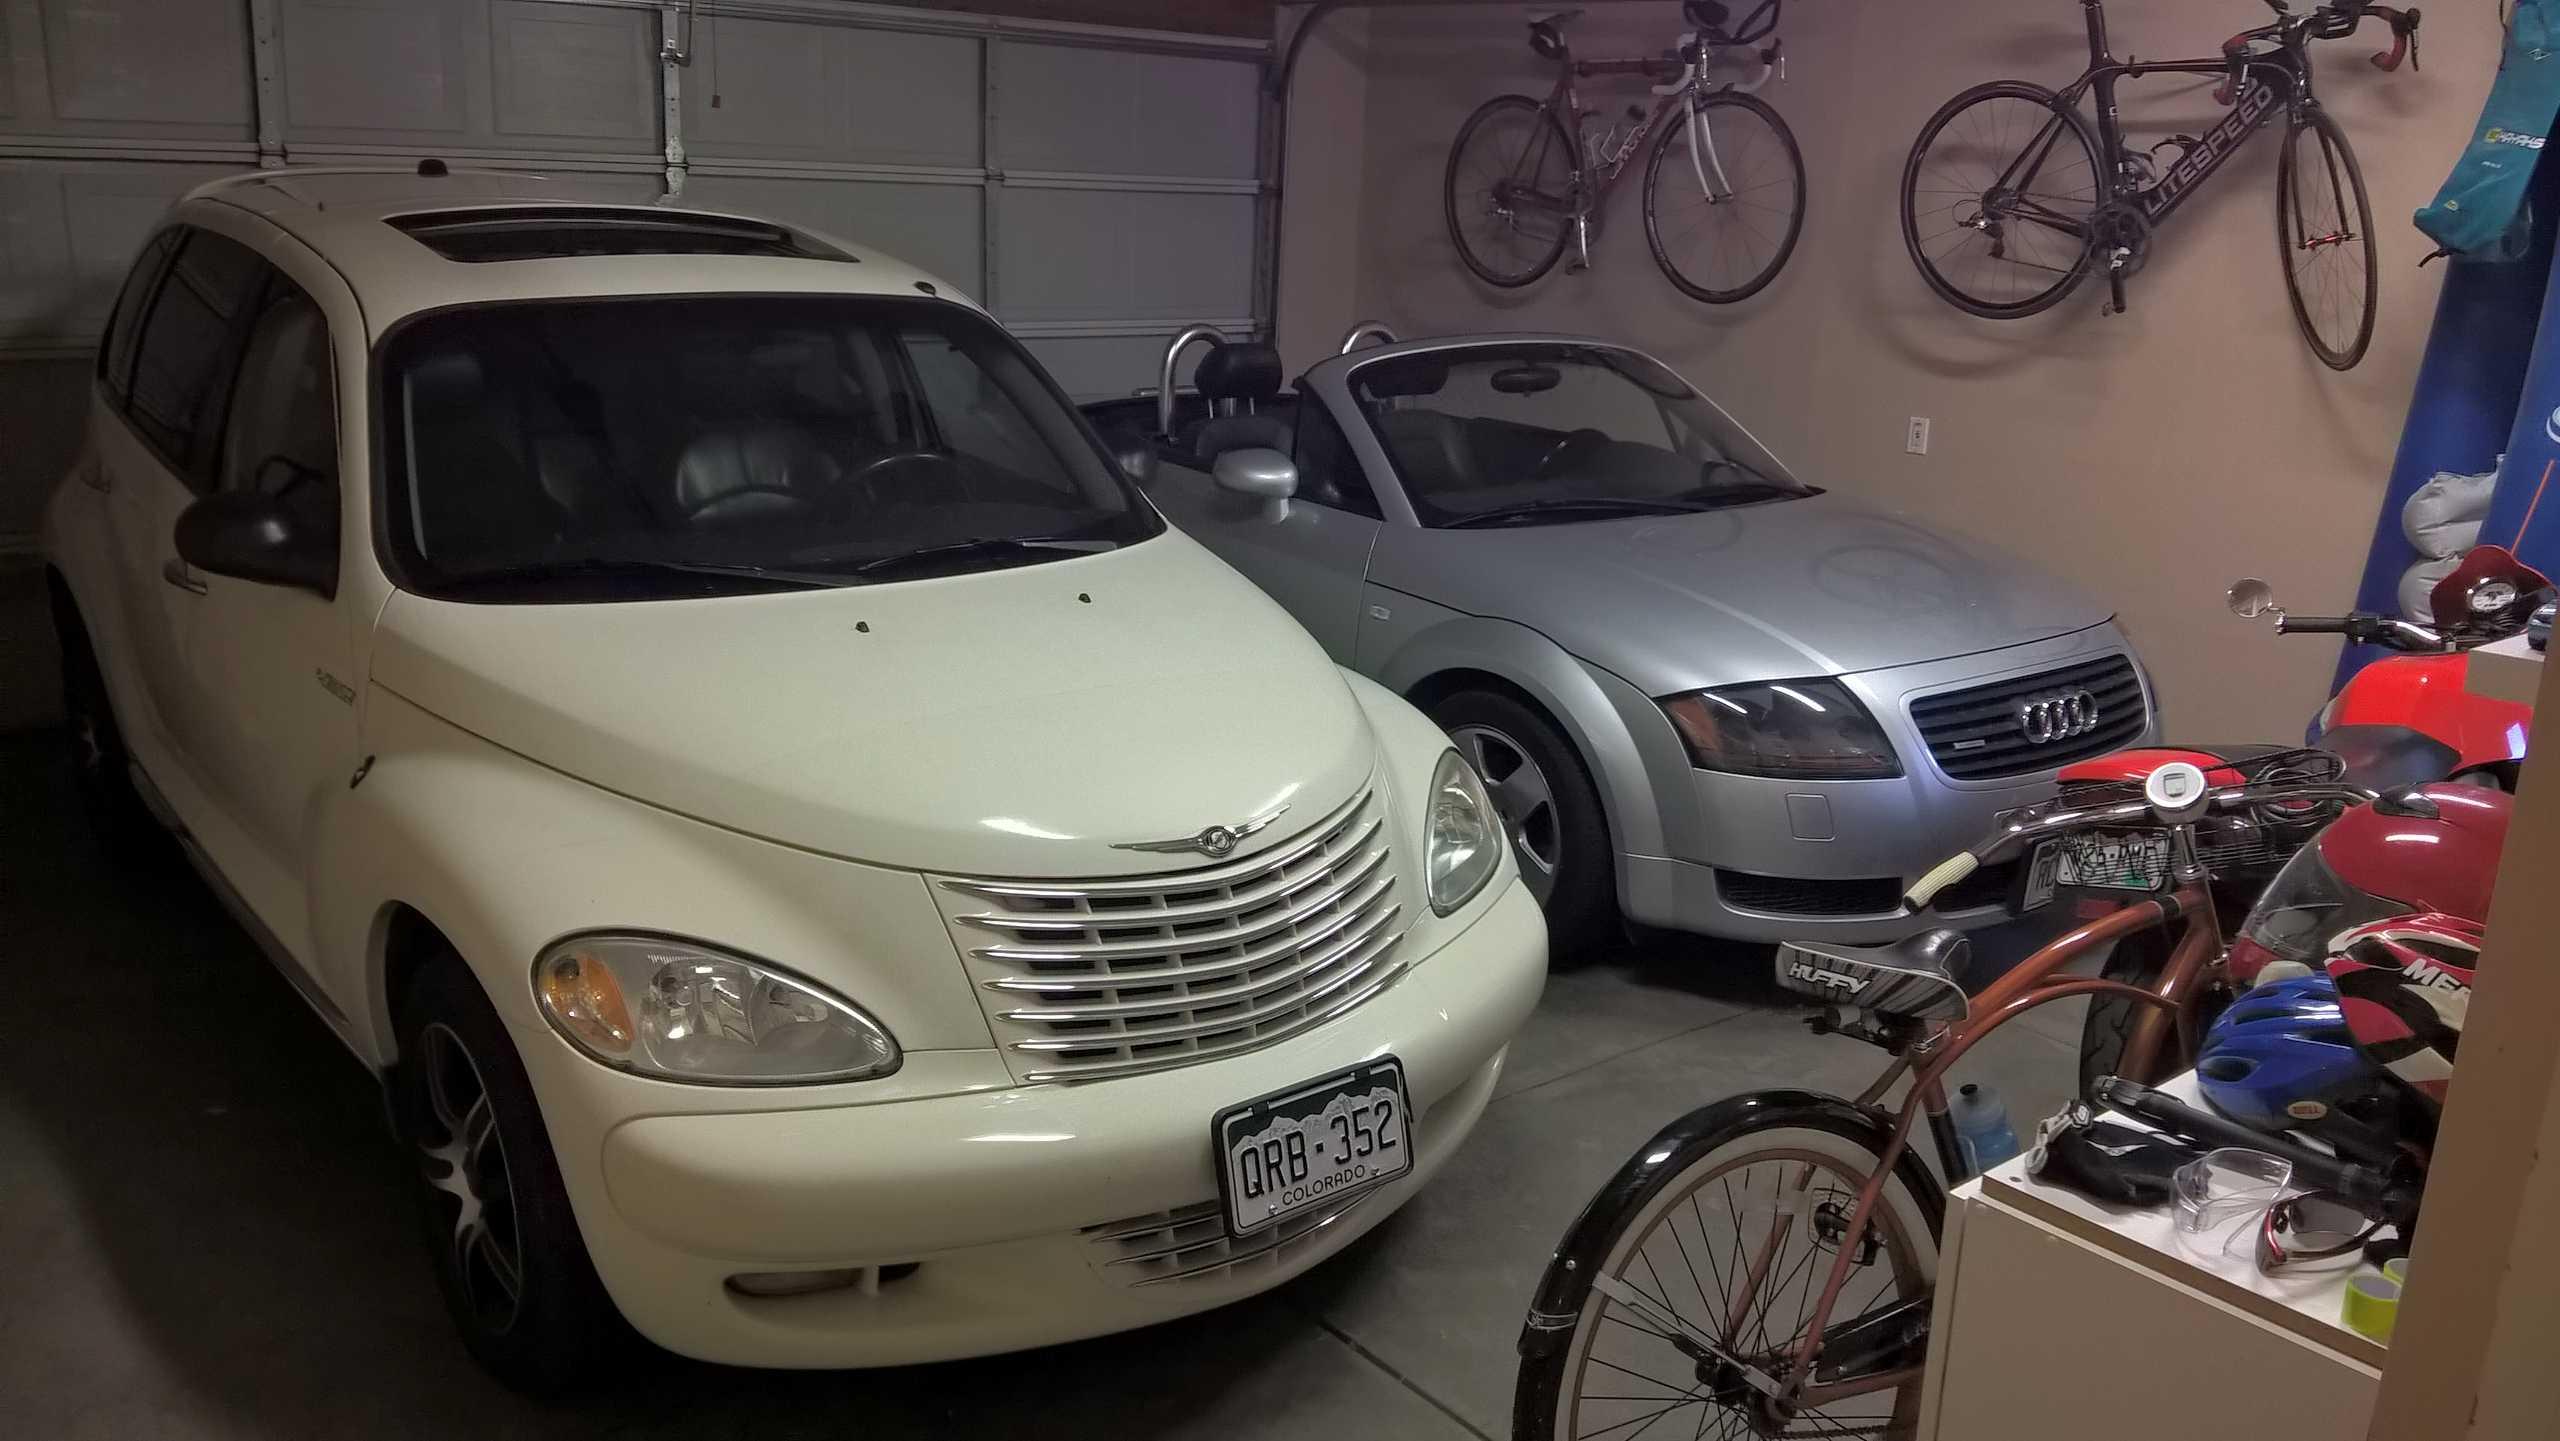 ... Cool Vanilla 2005 PT Cruiser GT, silver 2001 Audi TT Roadster Quattro,  bicycles,